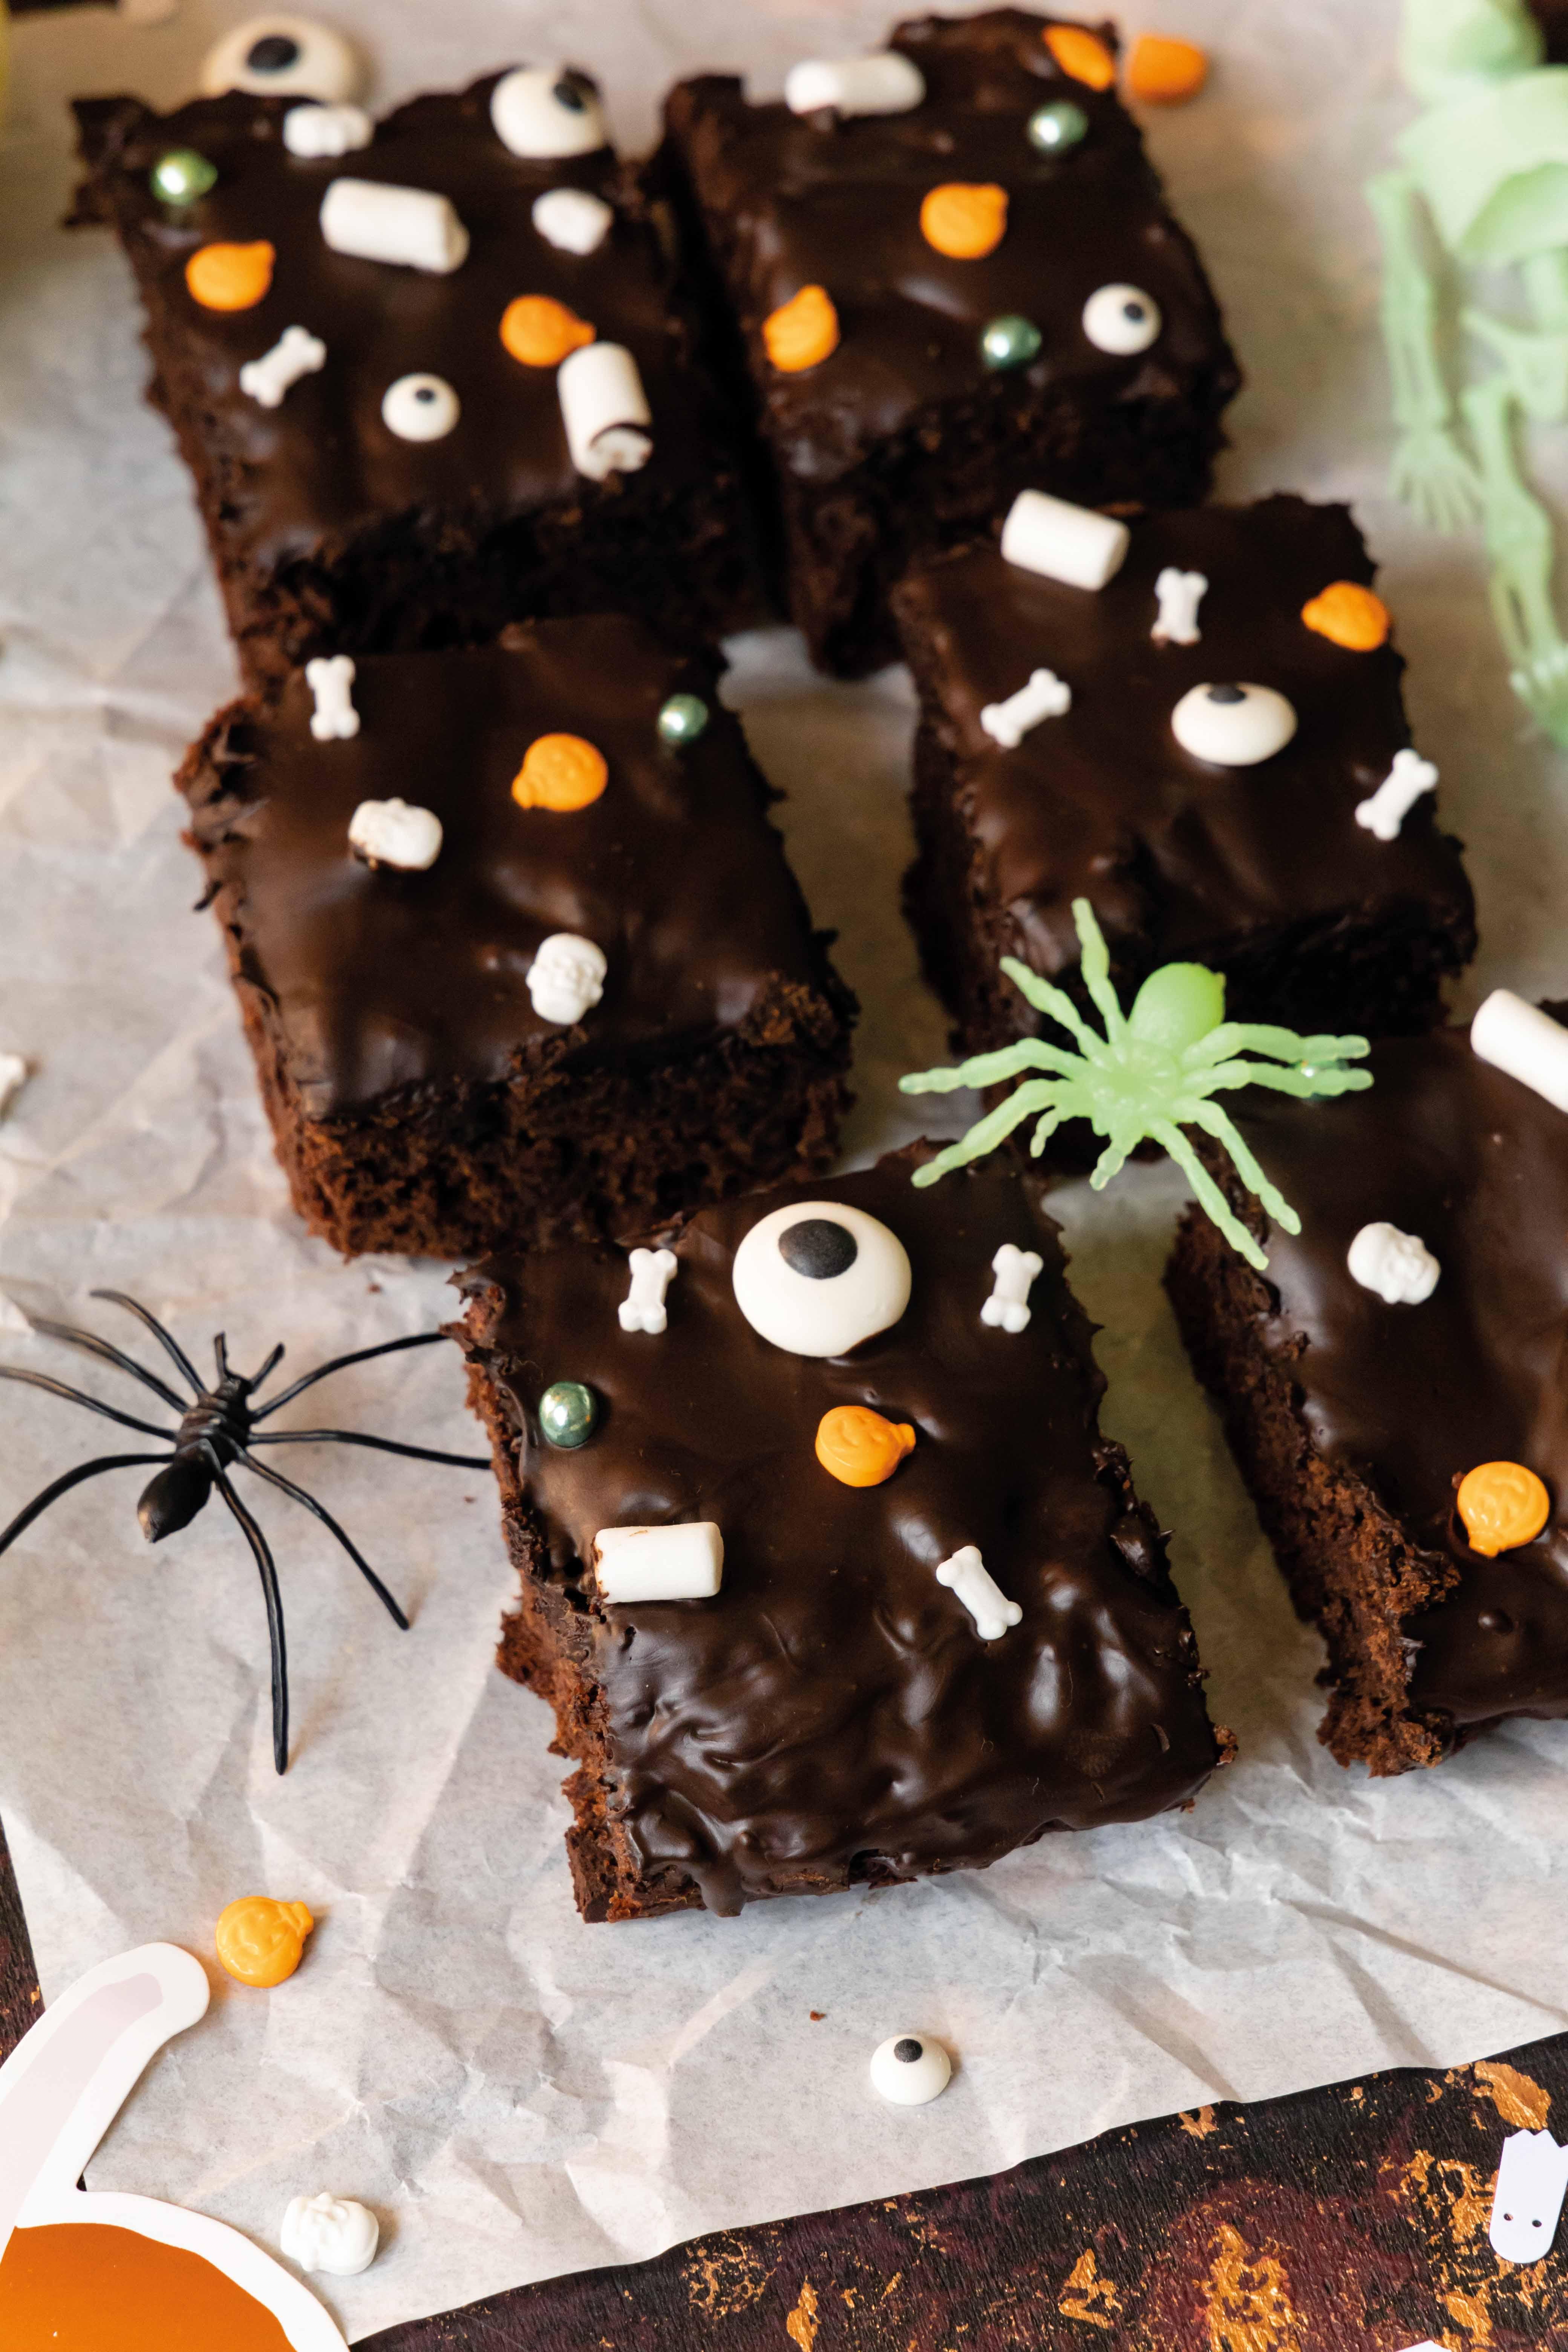 Halloween Kürbis Brownies mit Datteln // Halloween Pumpkin Brownies by https://babyrockmyday.com/halloween-kurbis-brownies/